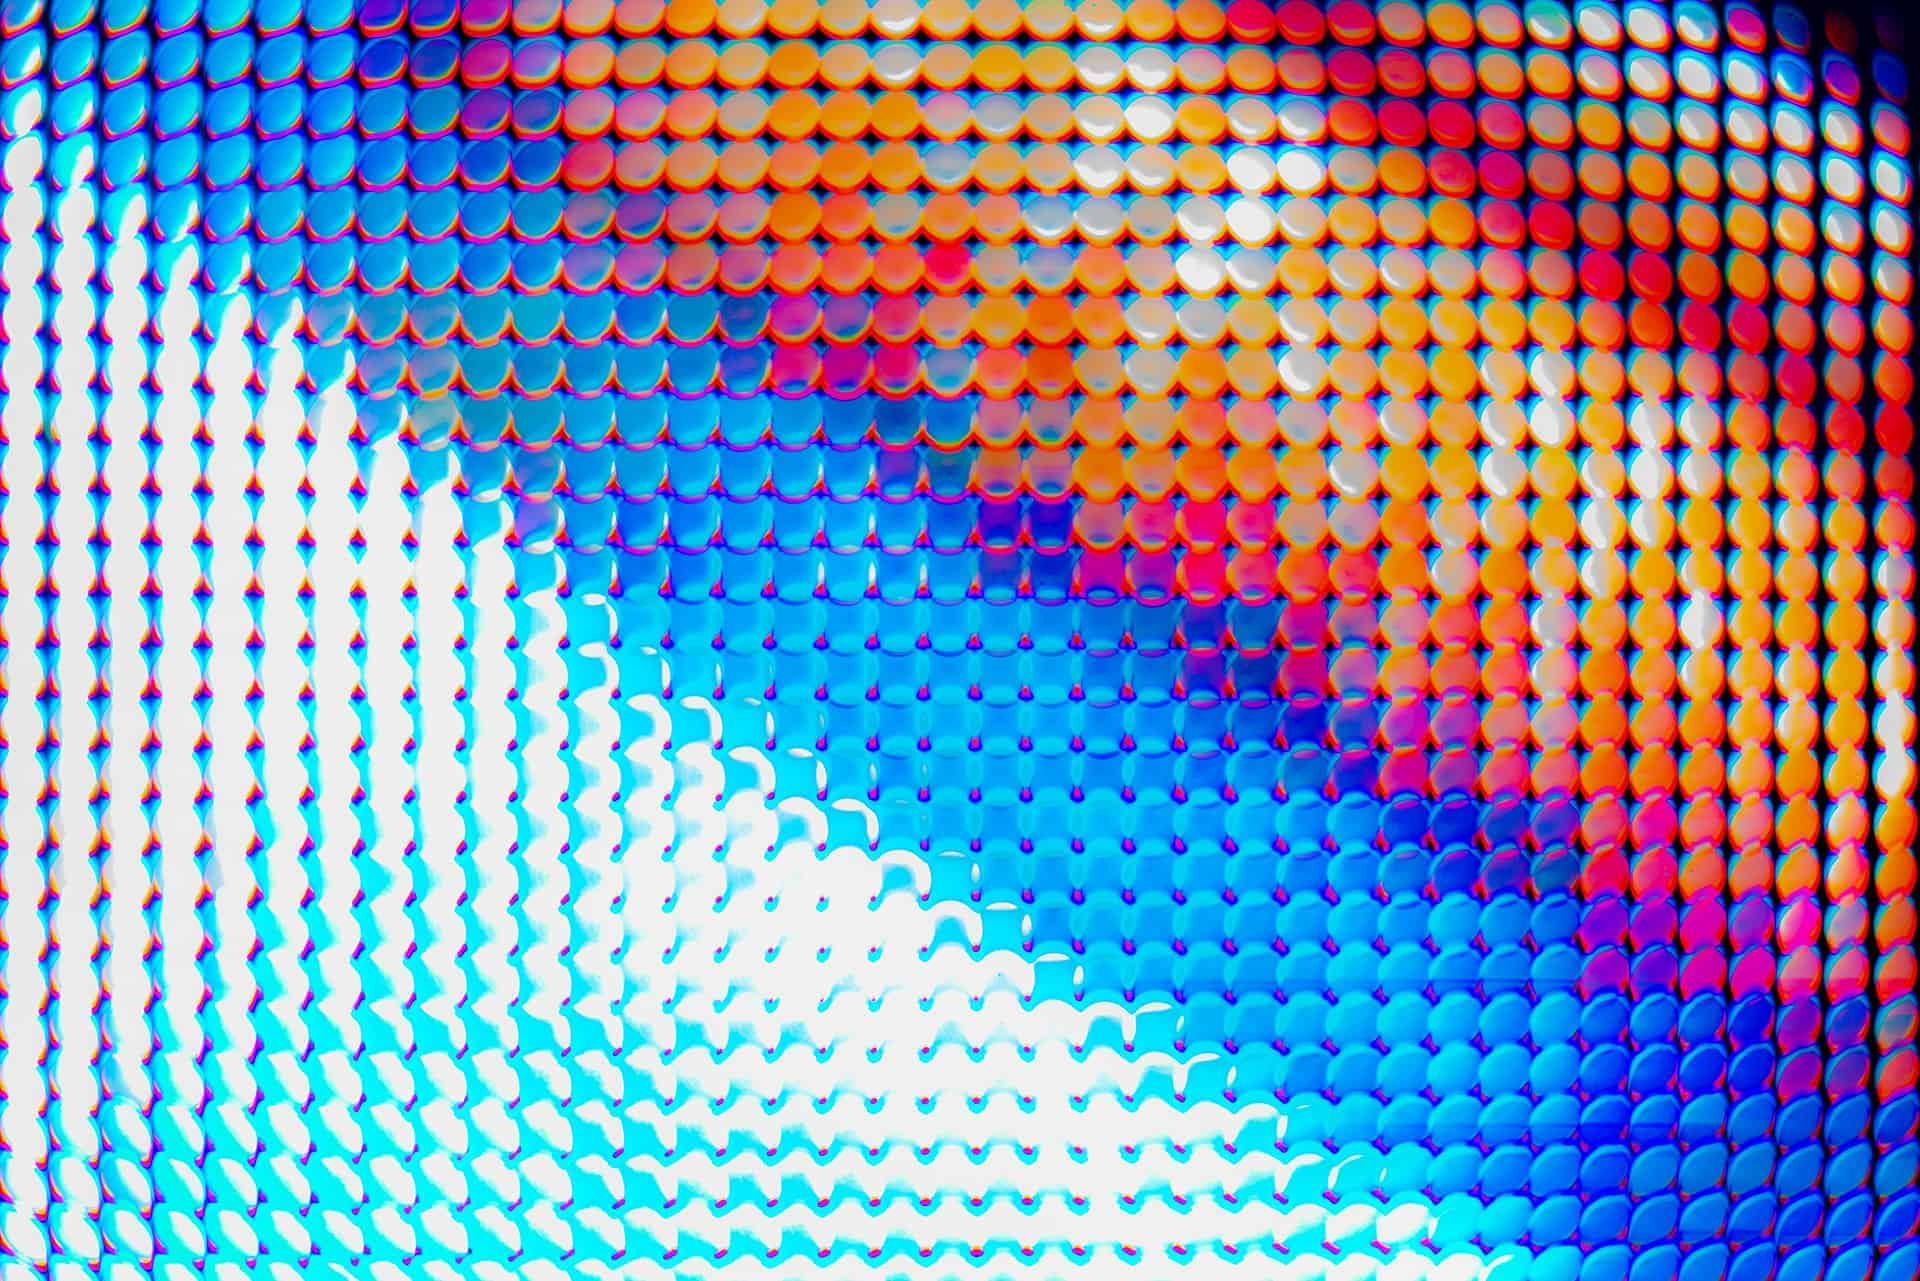 artnorama - Color Dot Wave